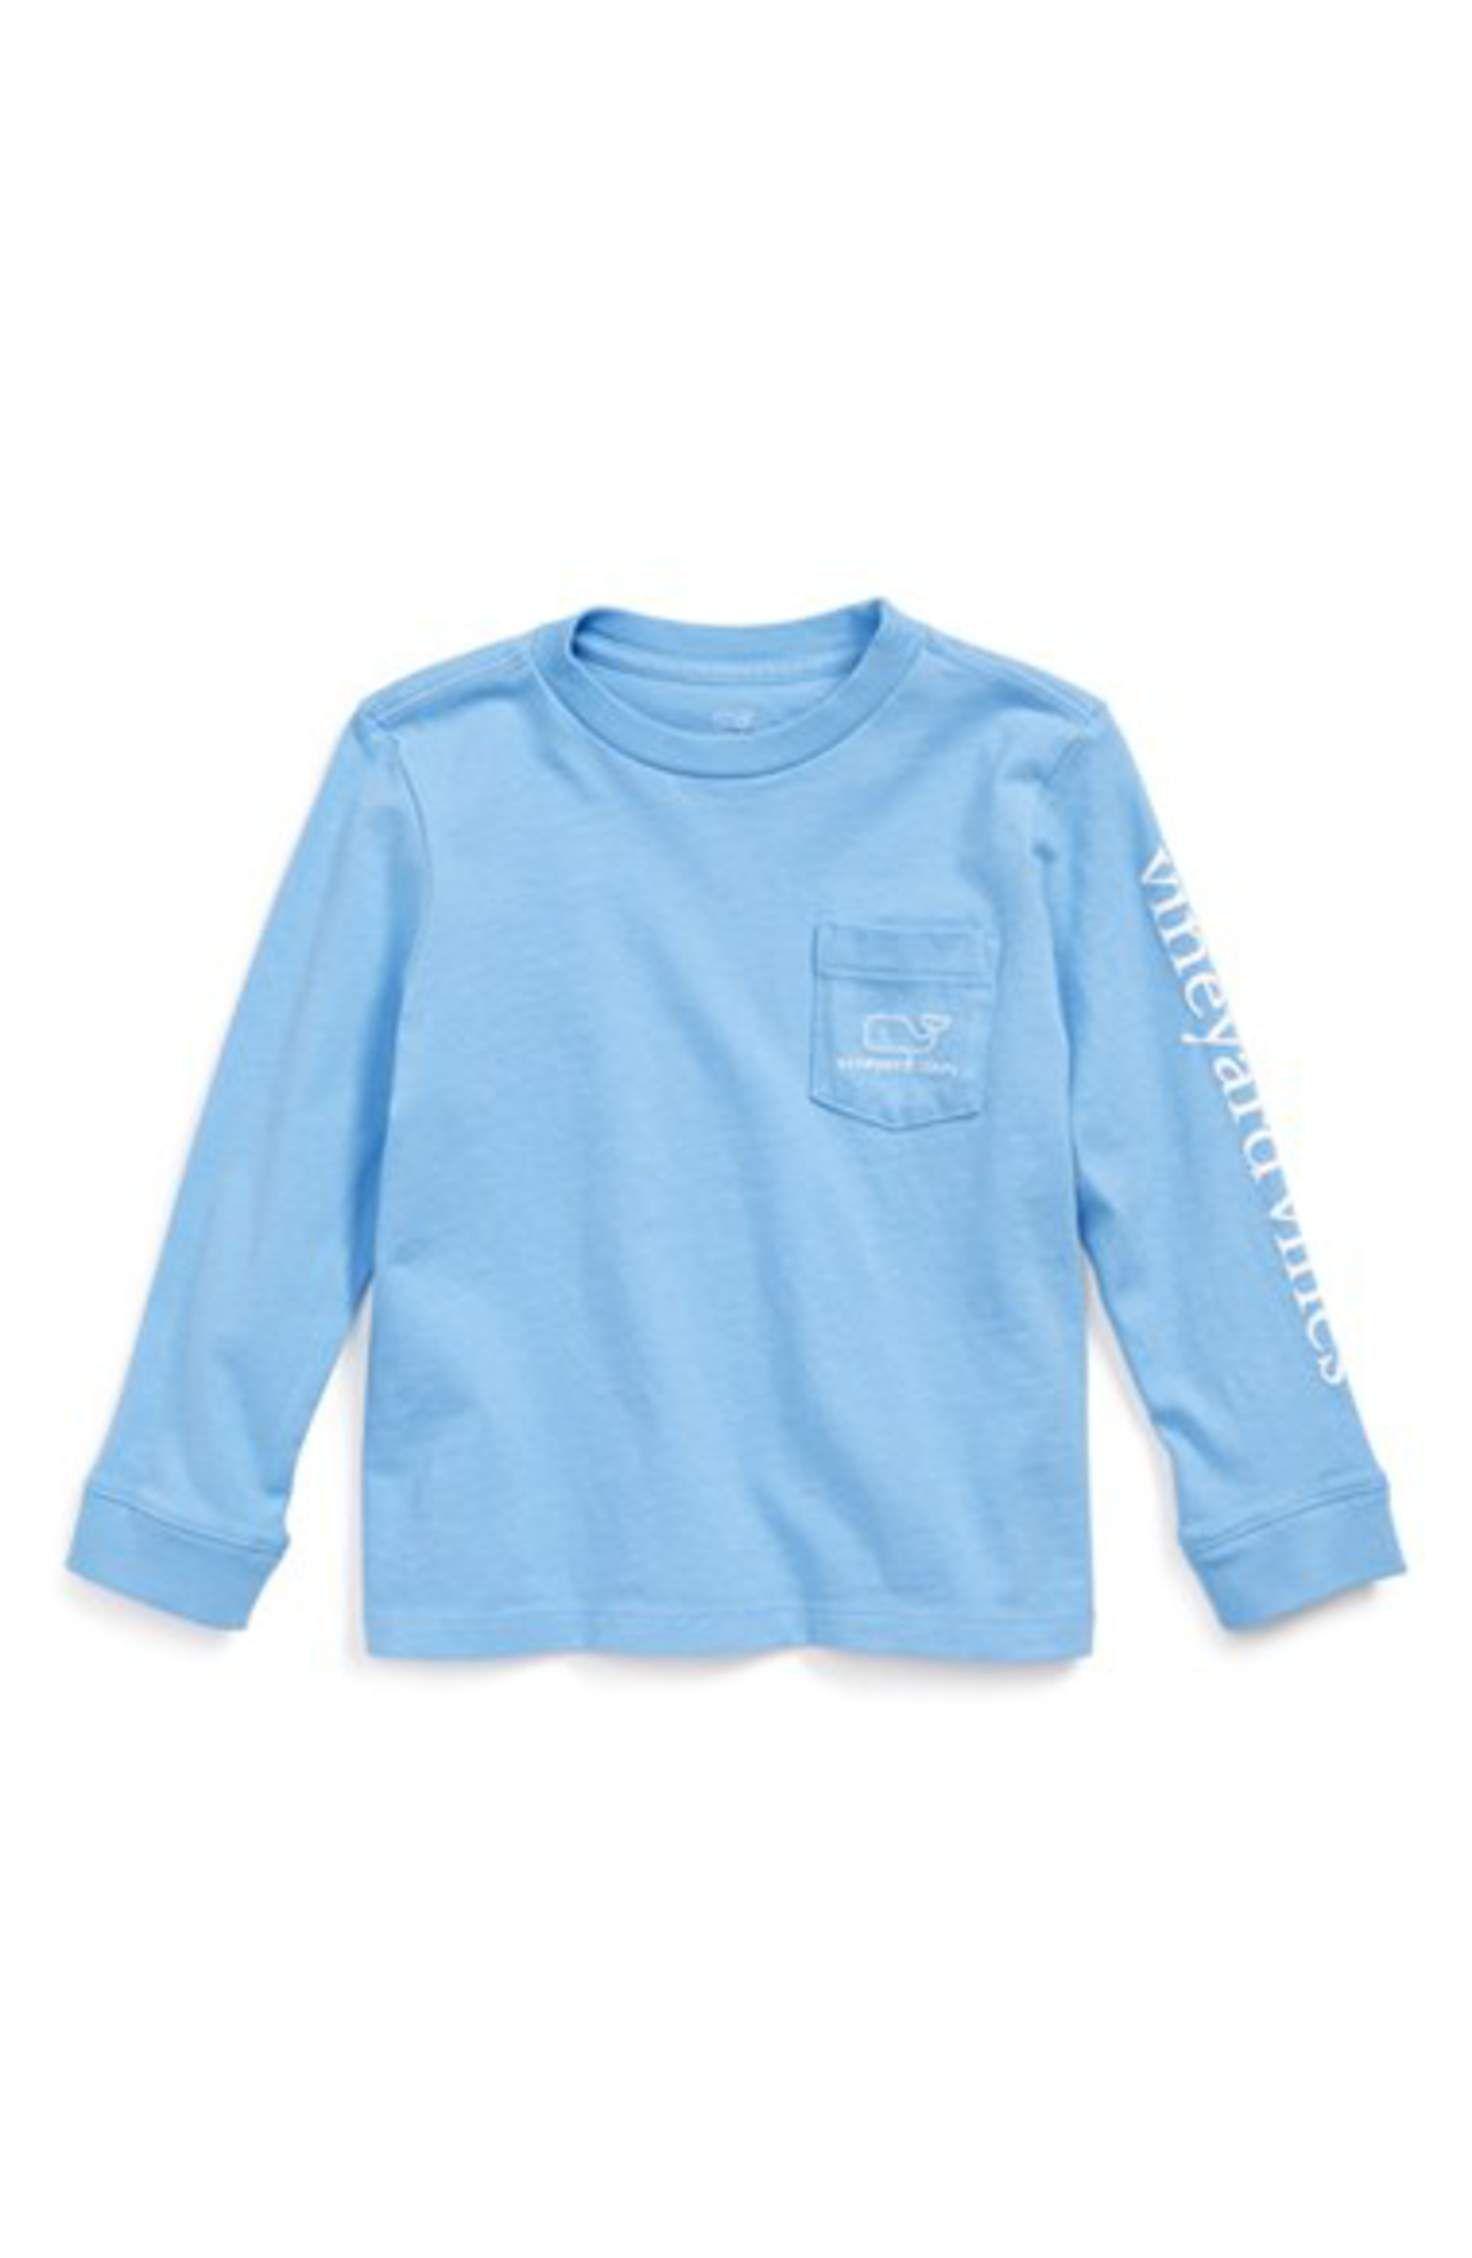 3300decc Vineyard Vines 'Vintage Whale' Graphic Long Sleeve T-Shirt (Toddler Boys &  Little Boys)   Nordstrom